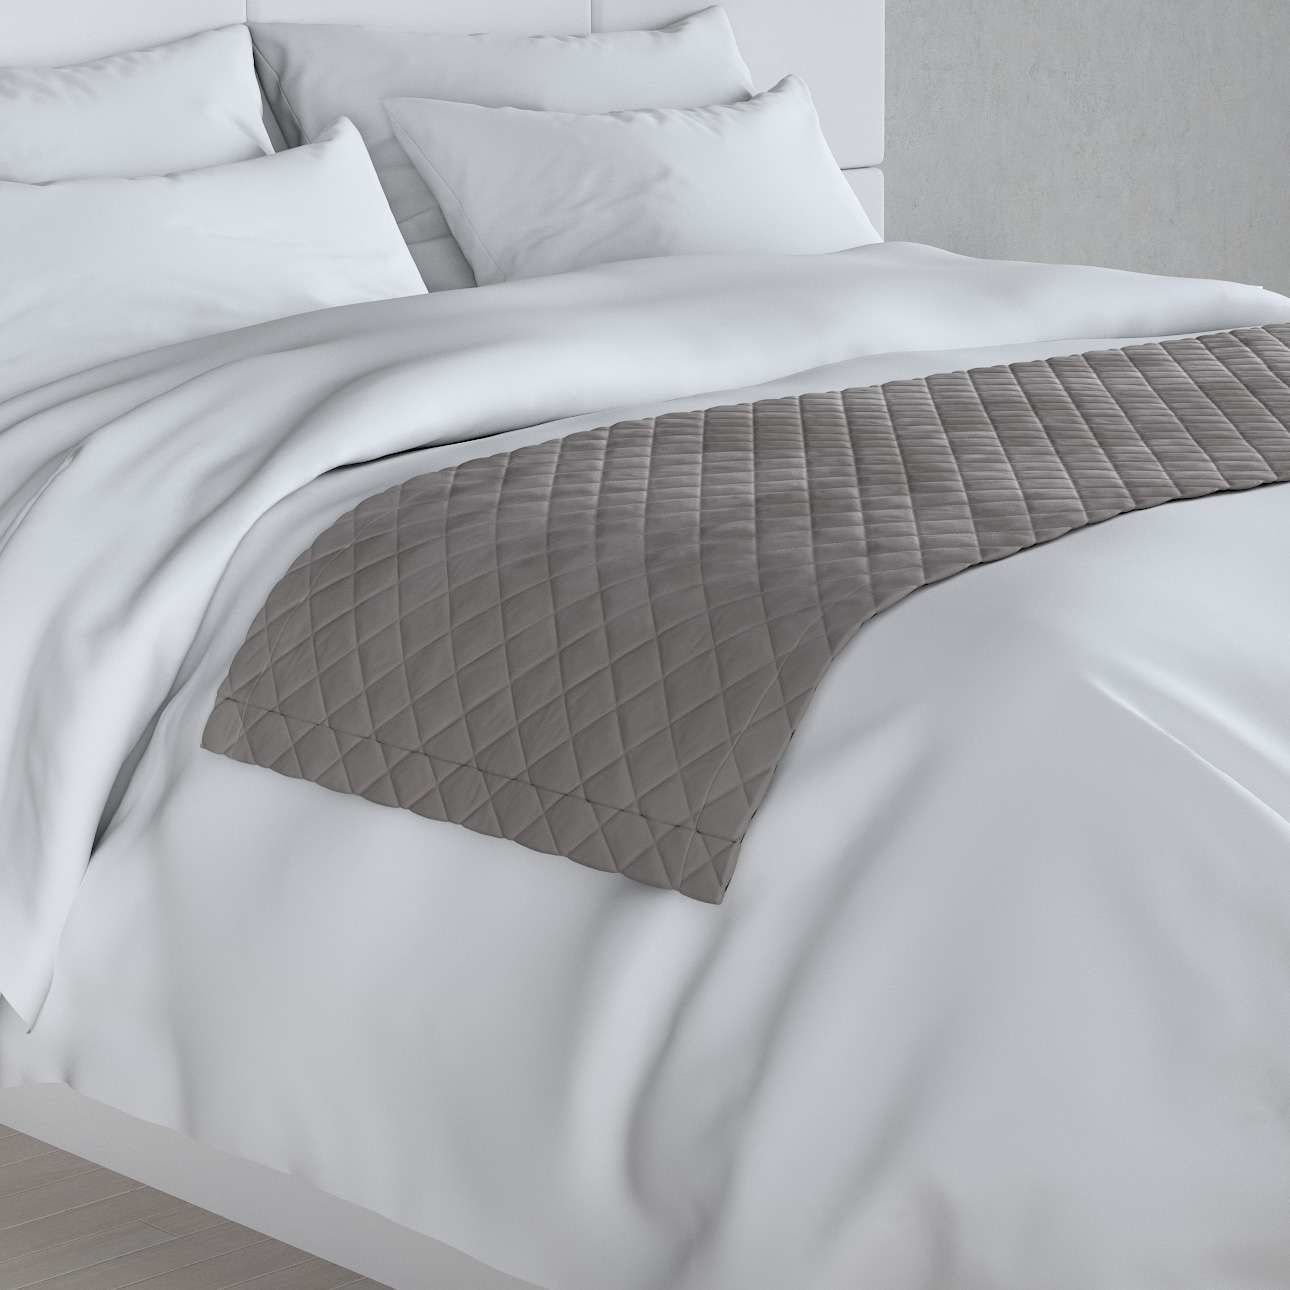 Narzuta hotelowa bieżnik Velvet 60x200cm, gołębi szary, 60 x 200 cm, Velvet